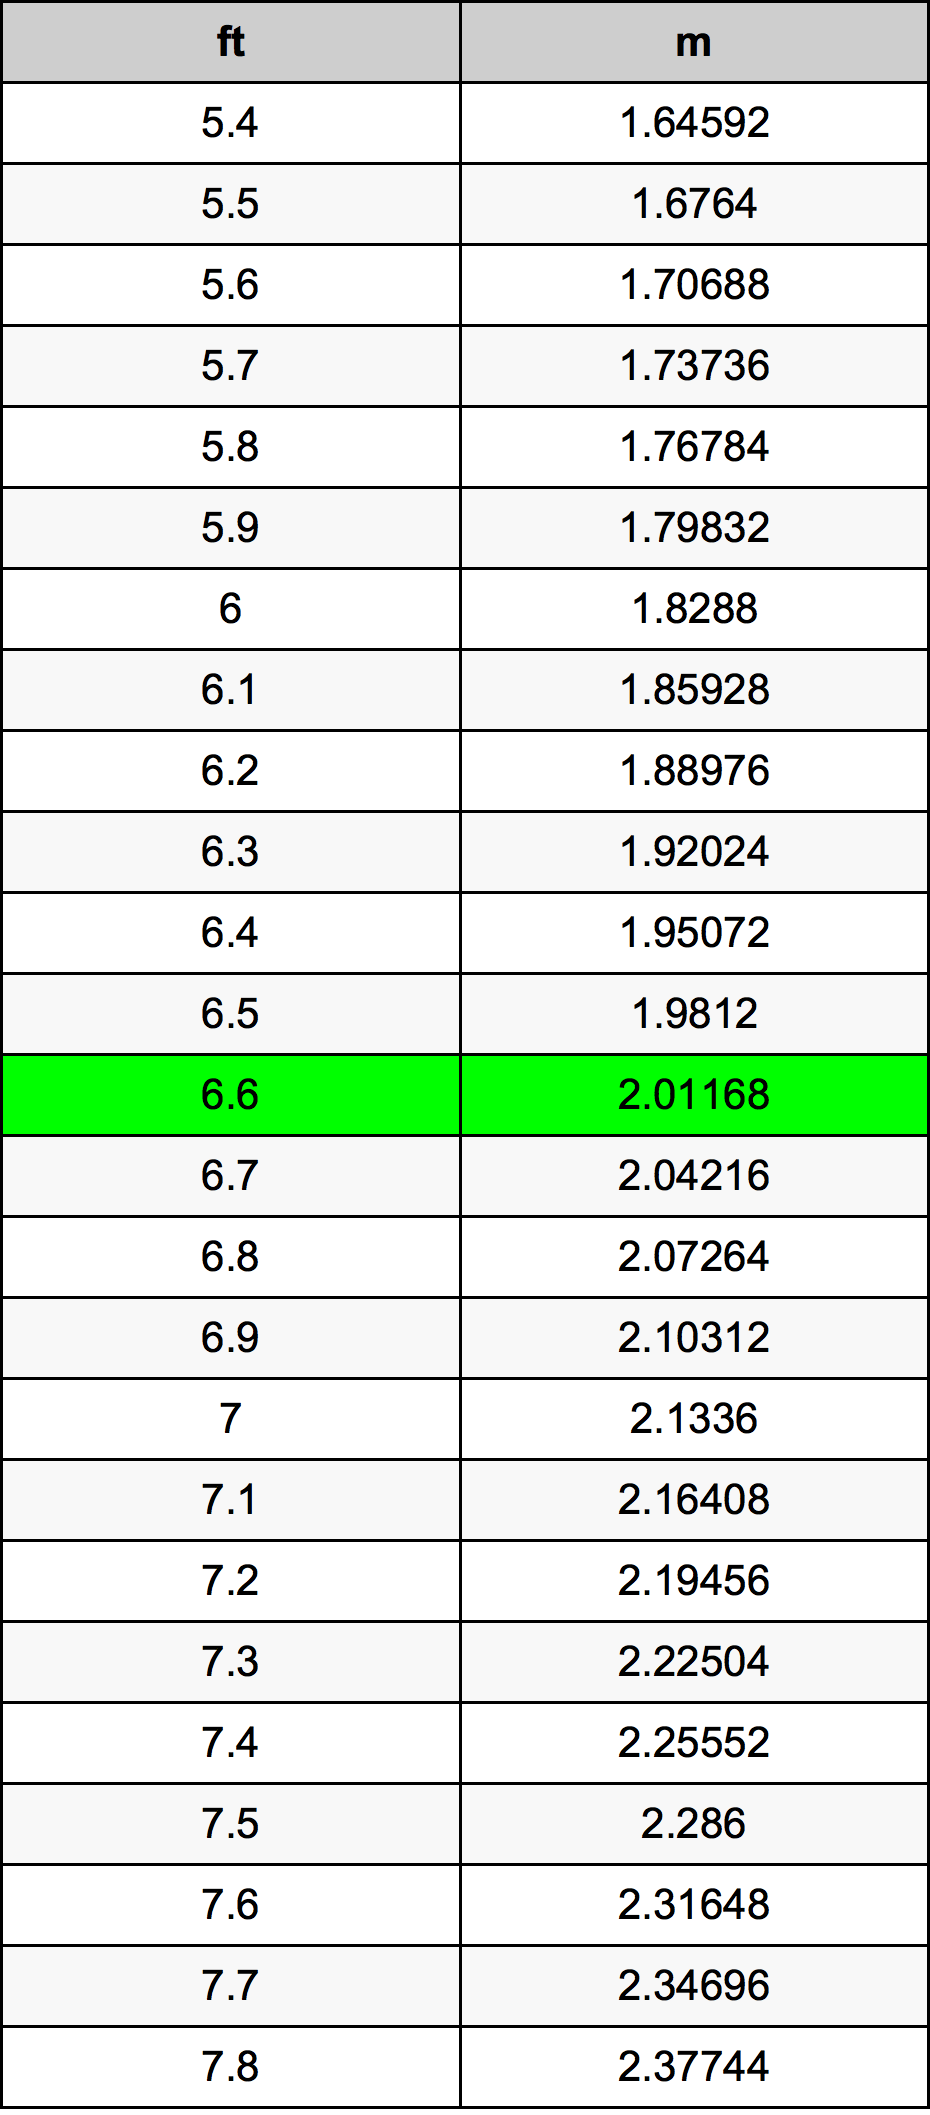 6.6 フィート